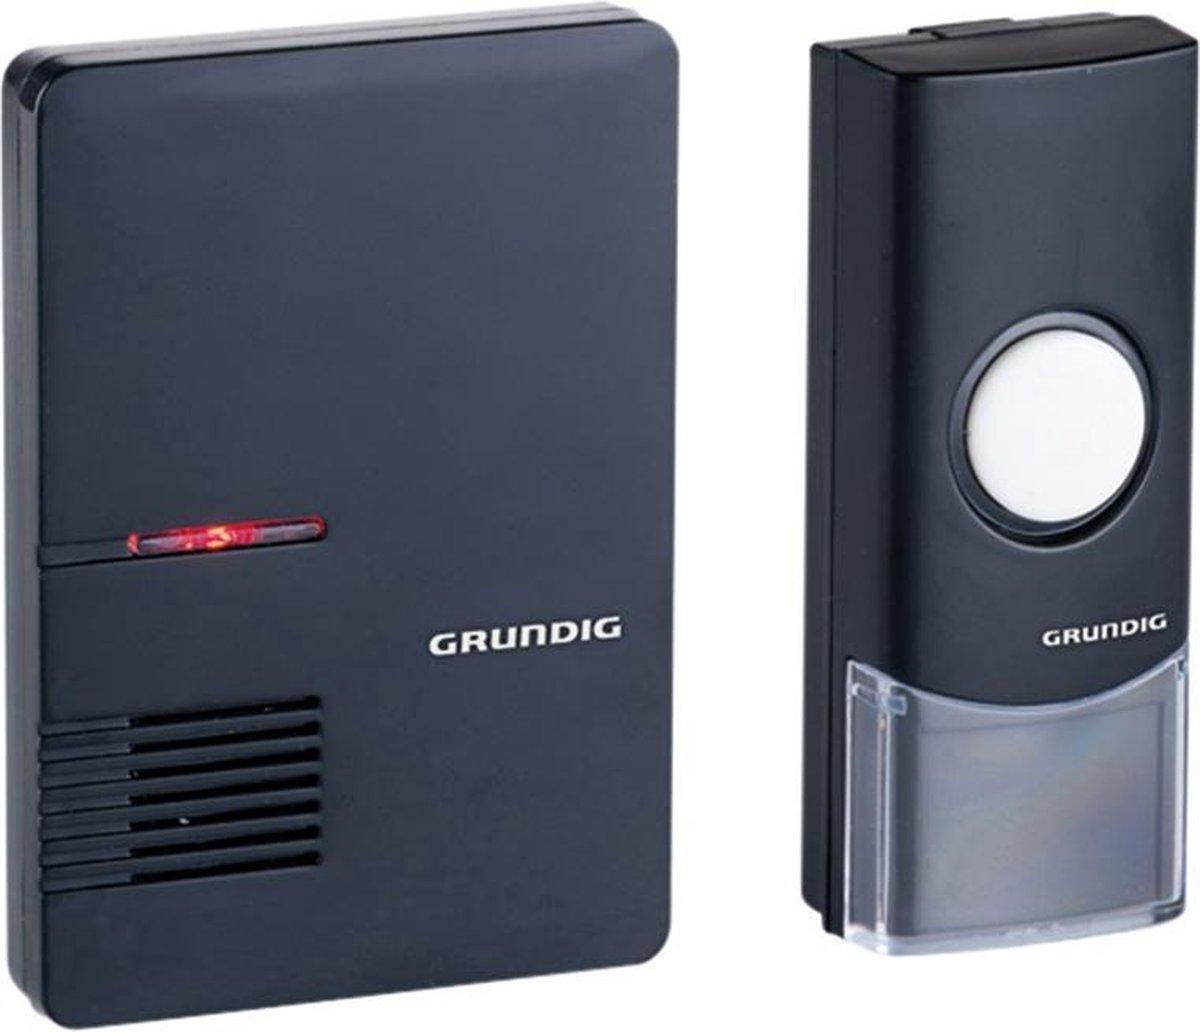 Grundig - Draadloze deurbel - LED - 36 Tunes - Bereik 80m2